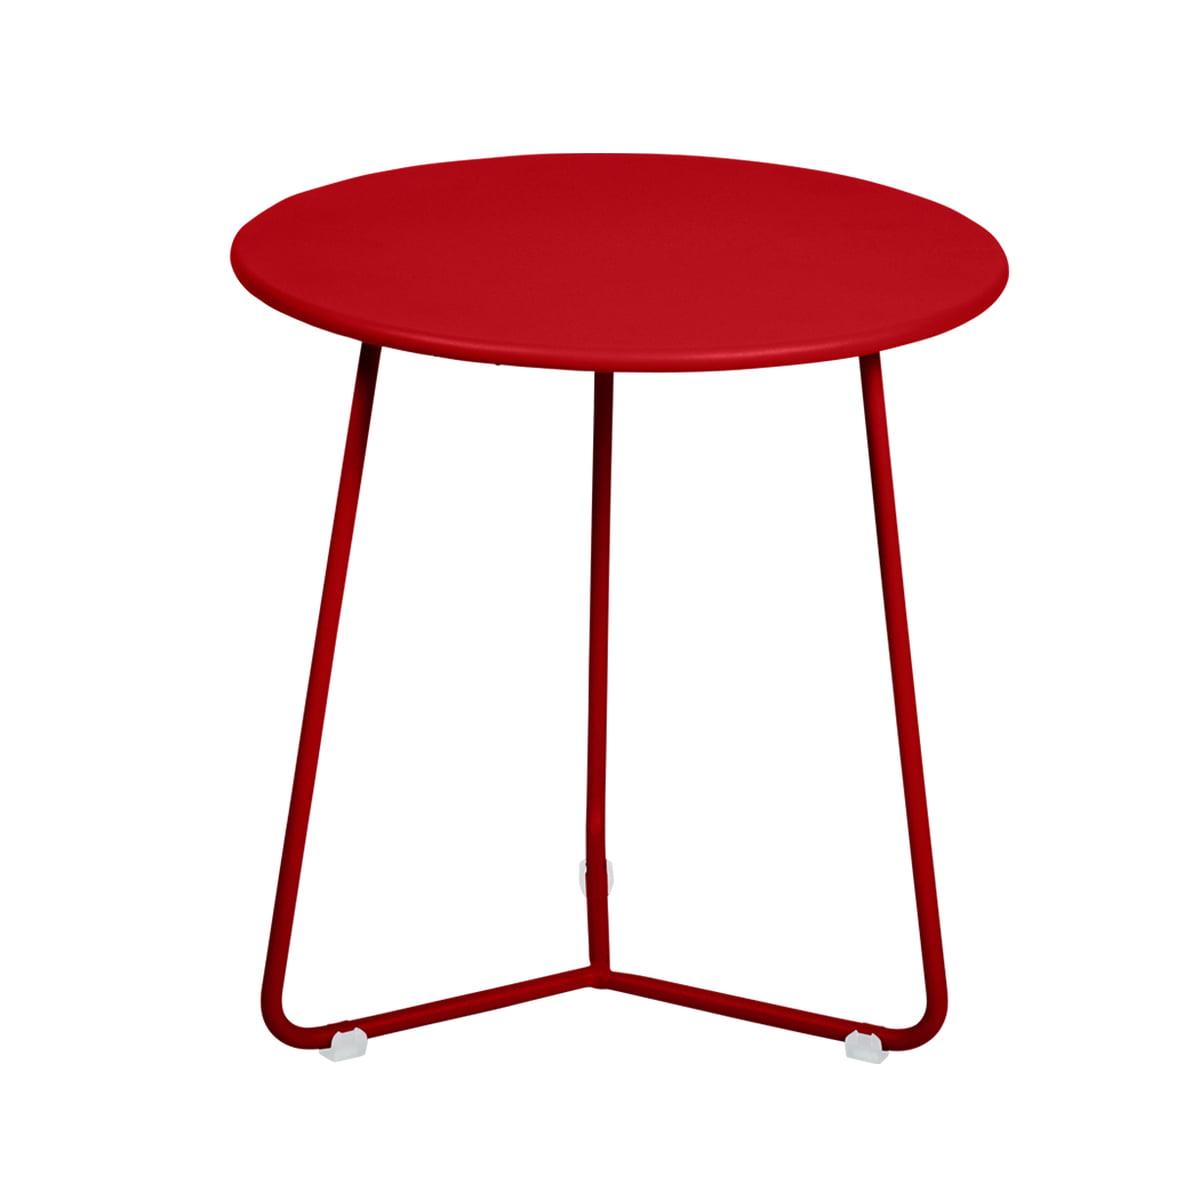 table d 39 appoint tabouret cocotte fermob connox. Black Bedroom Furniture Sets. Home Design Ideas